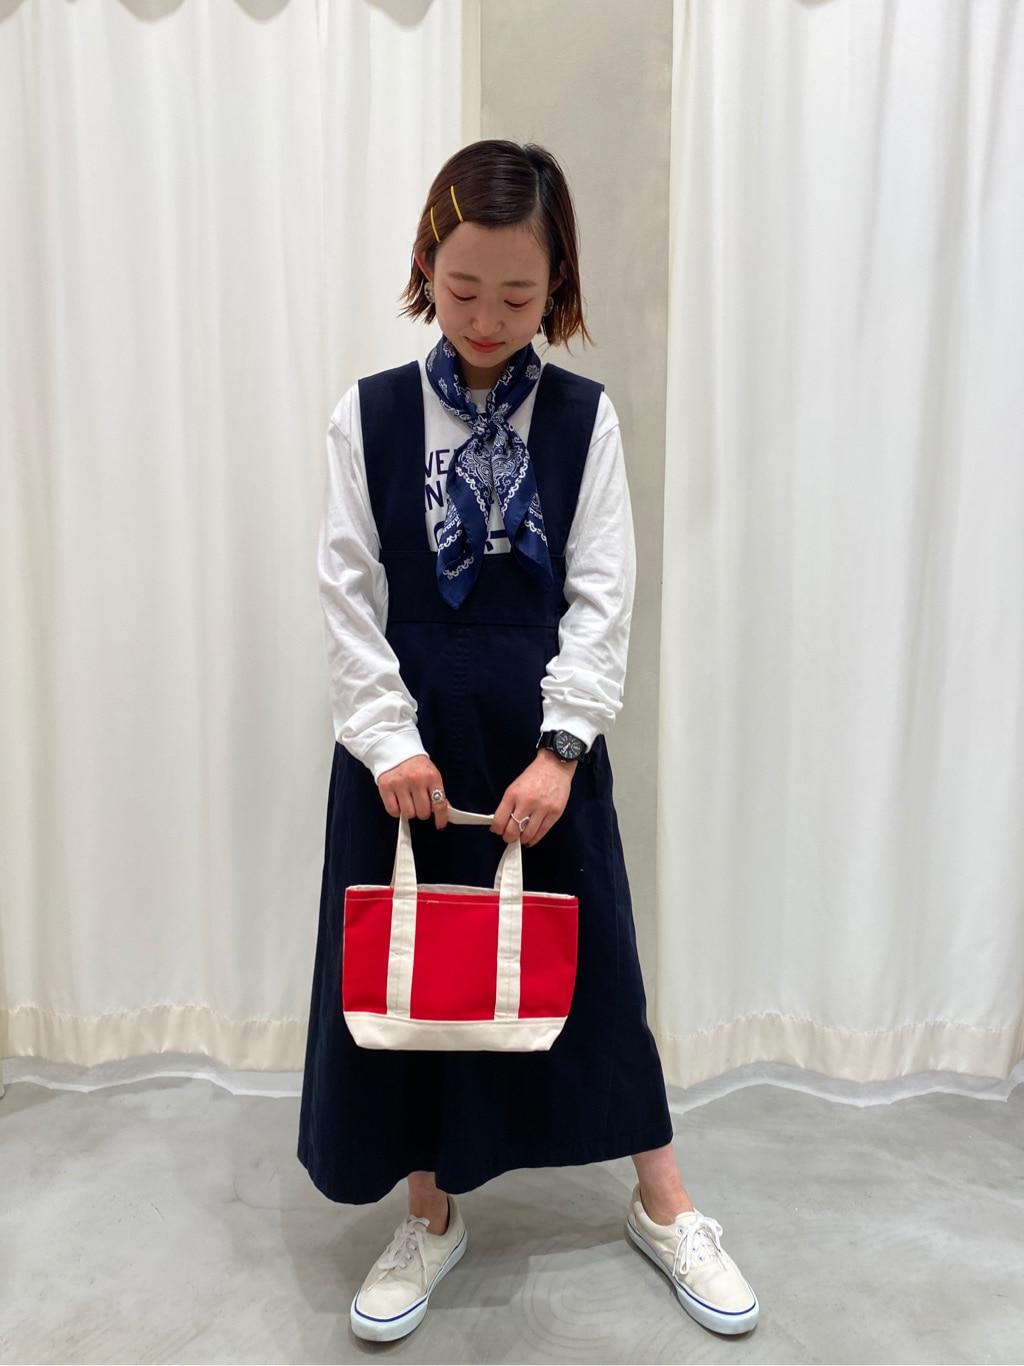 - CHILD WOMAN CHILD WOMAN , PAR ICI 東京スカイツリータウン・ソラマチ 身長:150cm 2020.09.06